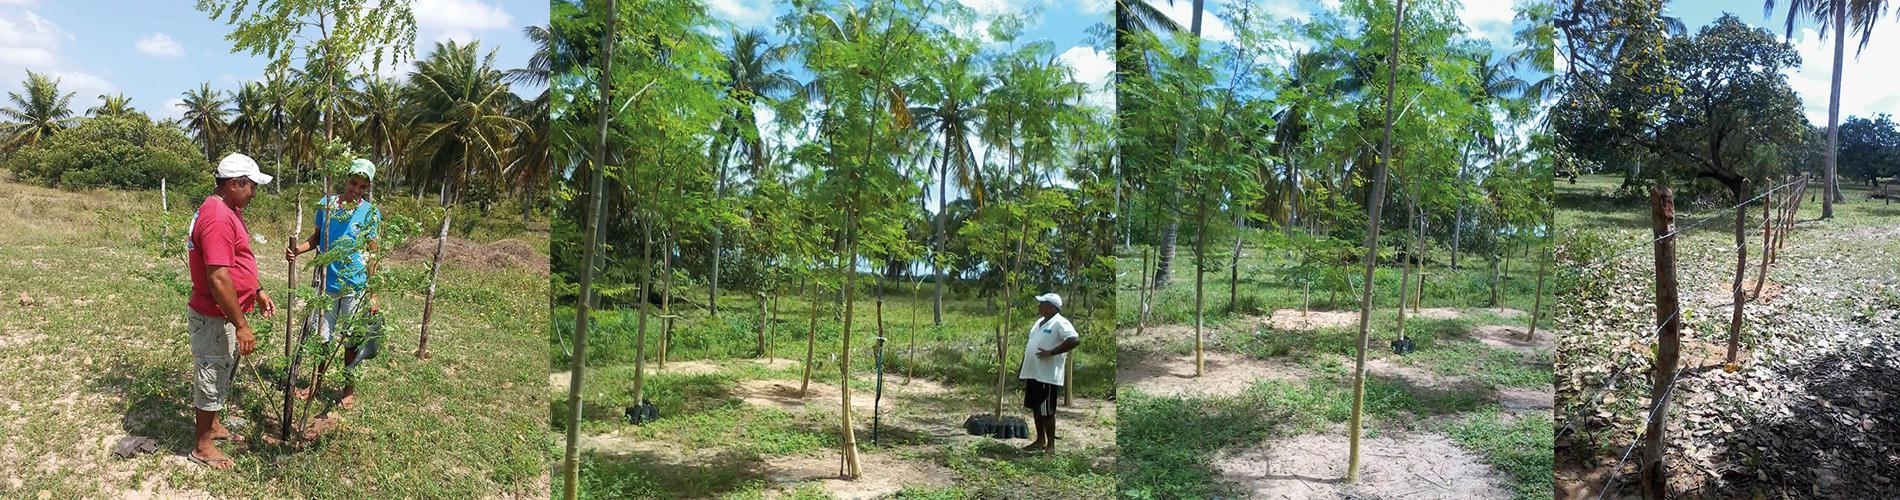 Blick auf das Farmland von Nós na Vida